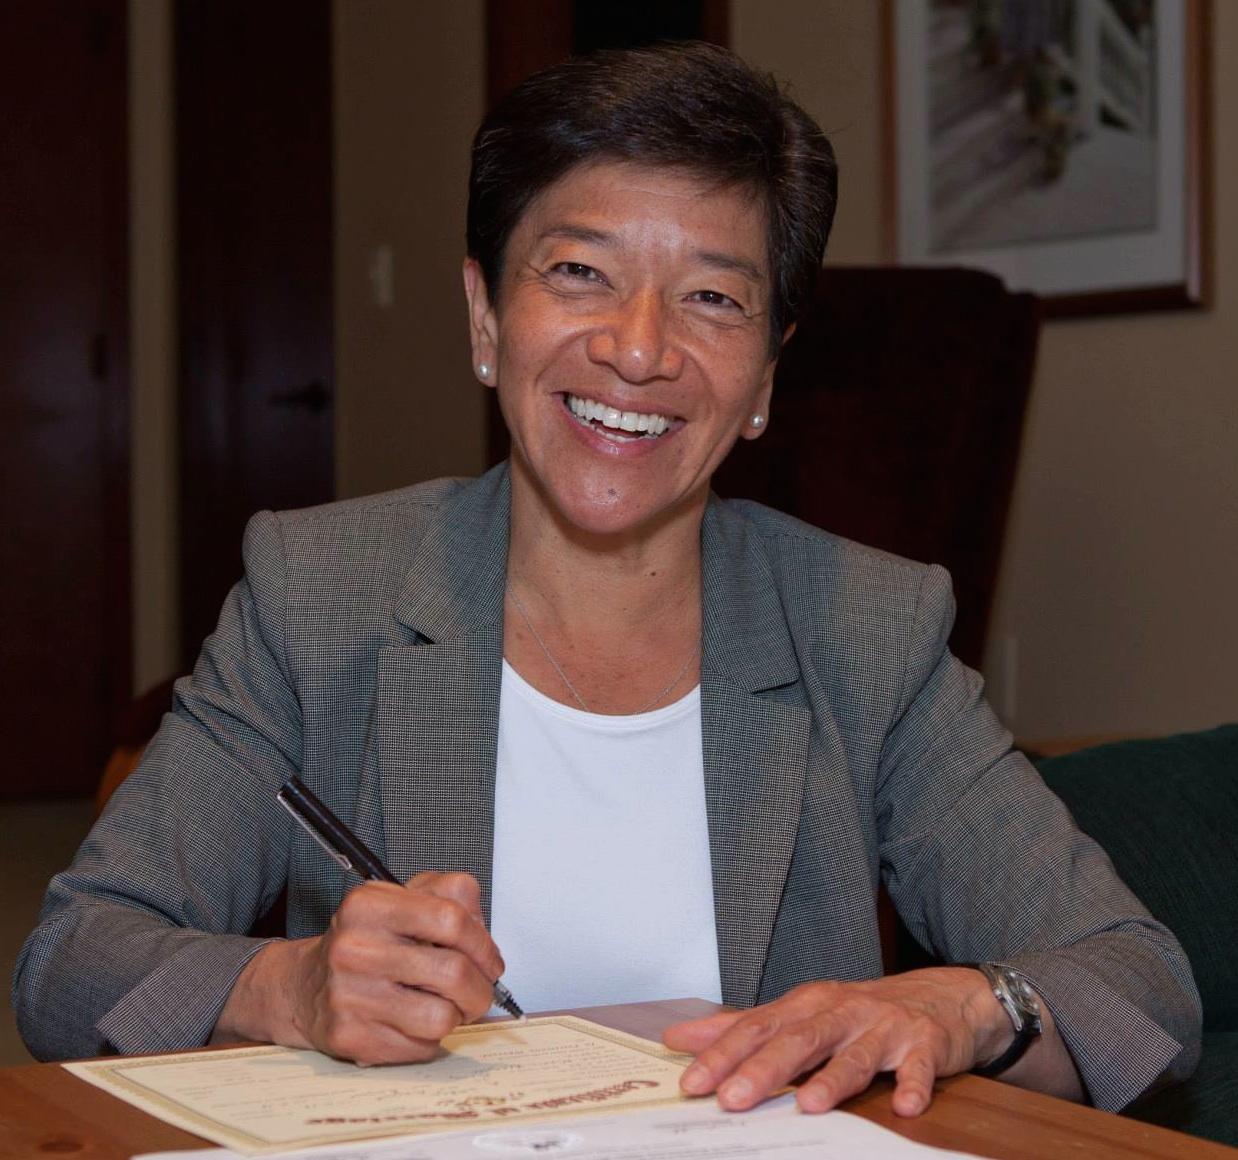 Justice Mary Yu to Visit Jefferson County's Alternative Juvenile Detention Facility